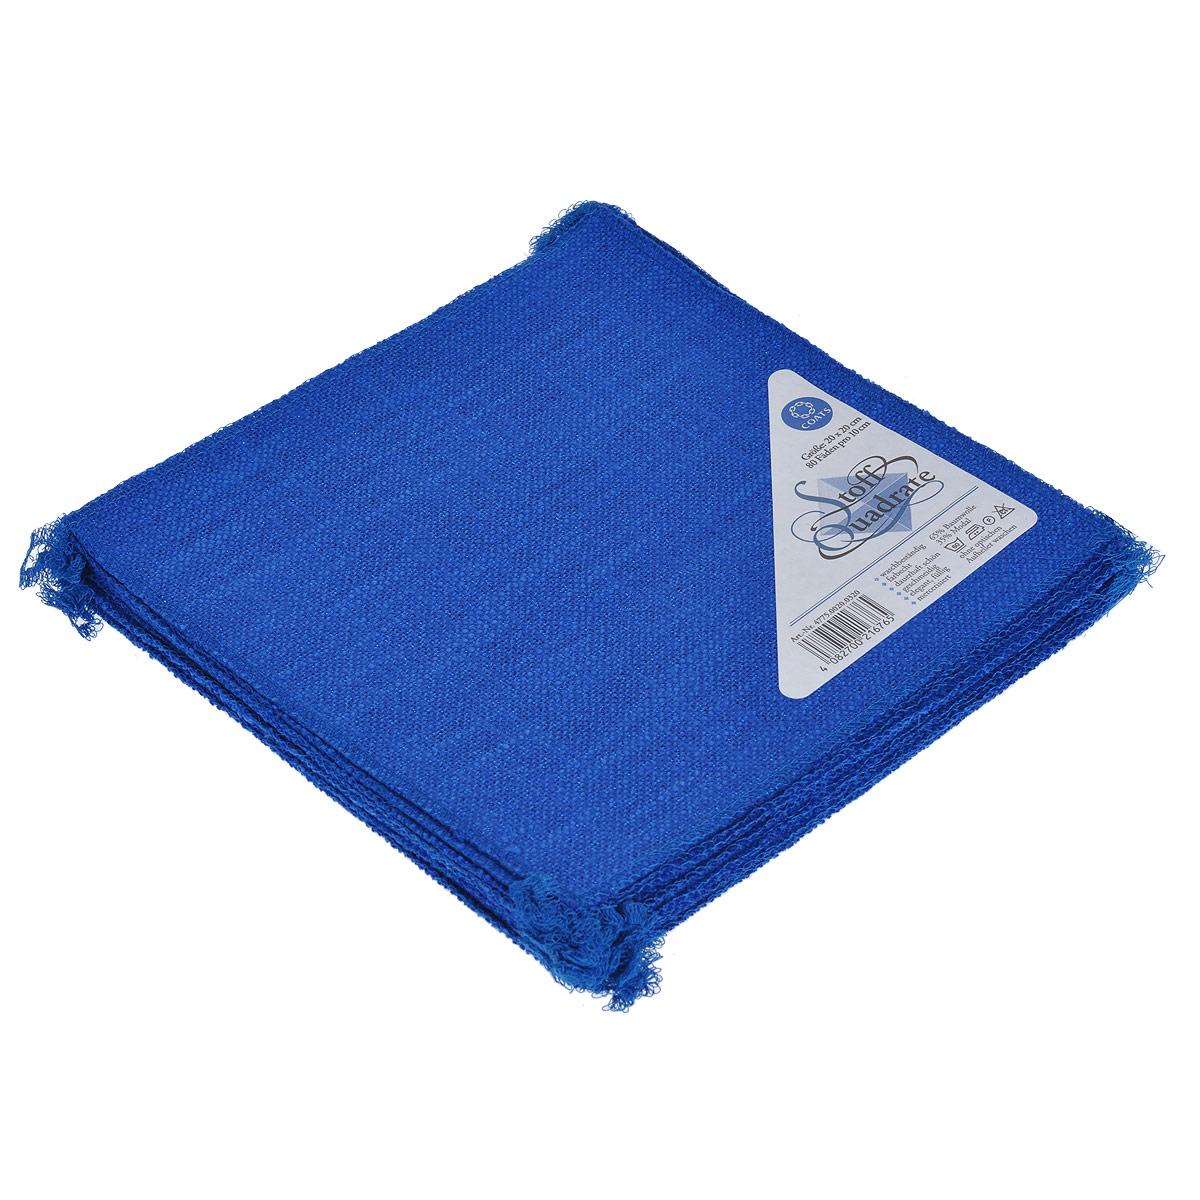 Салфетки для творчества Coats Stoff Quadrate, цвет: синий, 20 шт, 20 см х 20 см4775.0020.0320